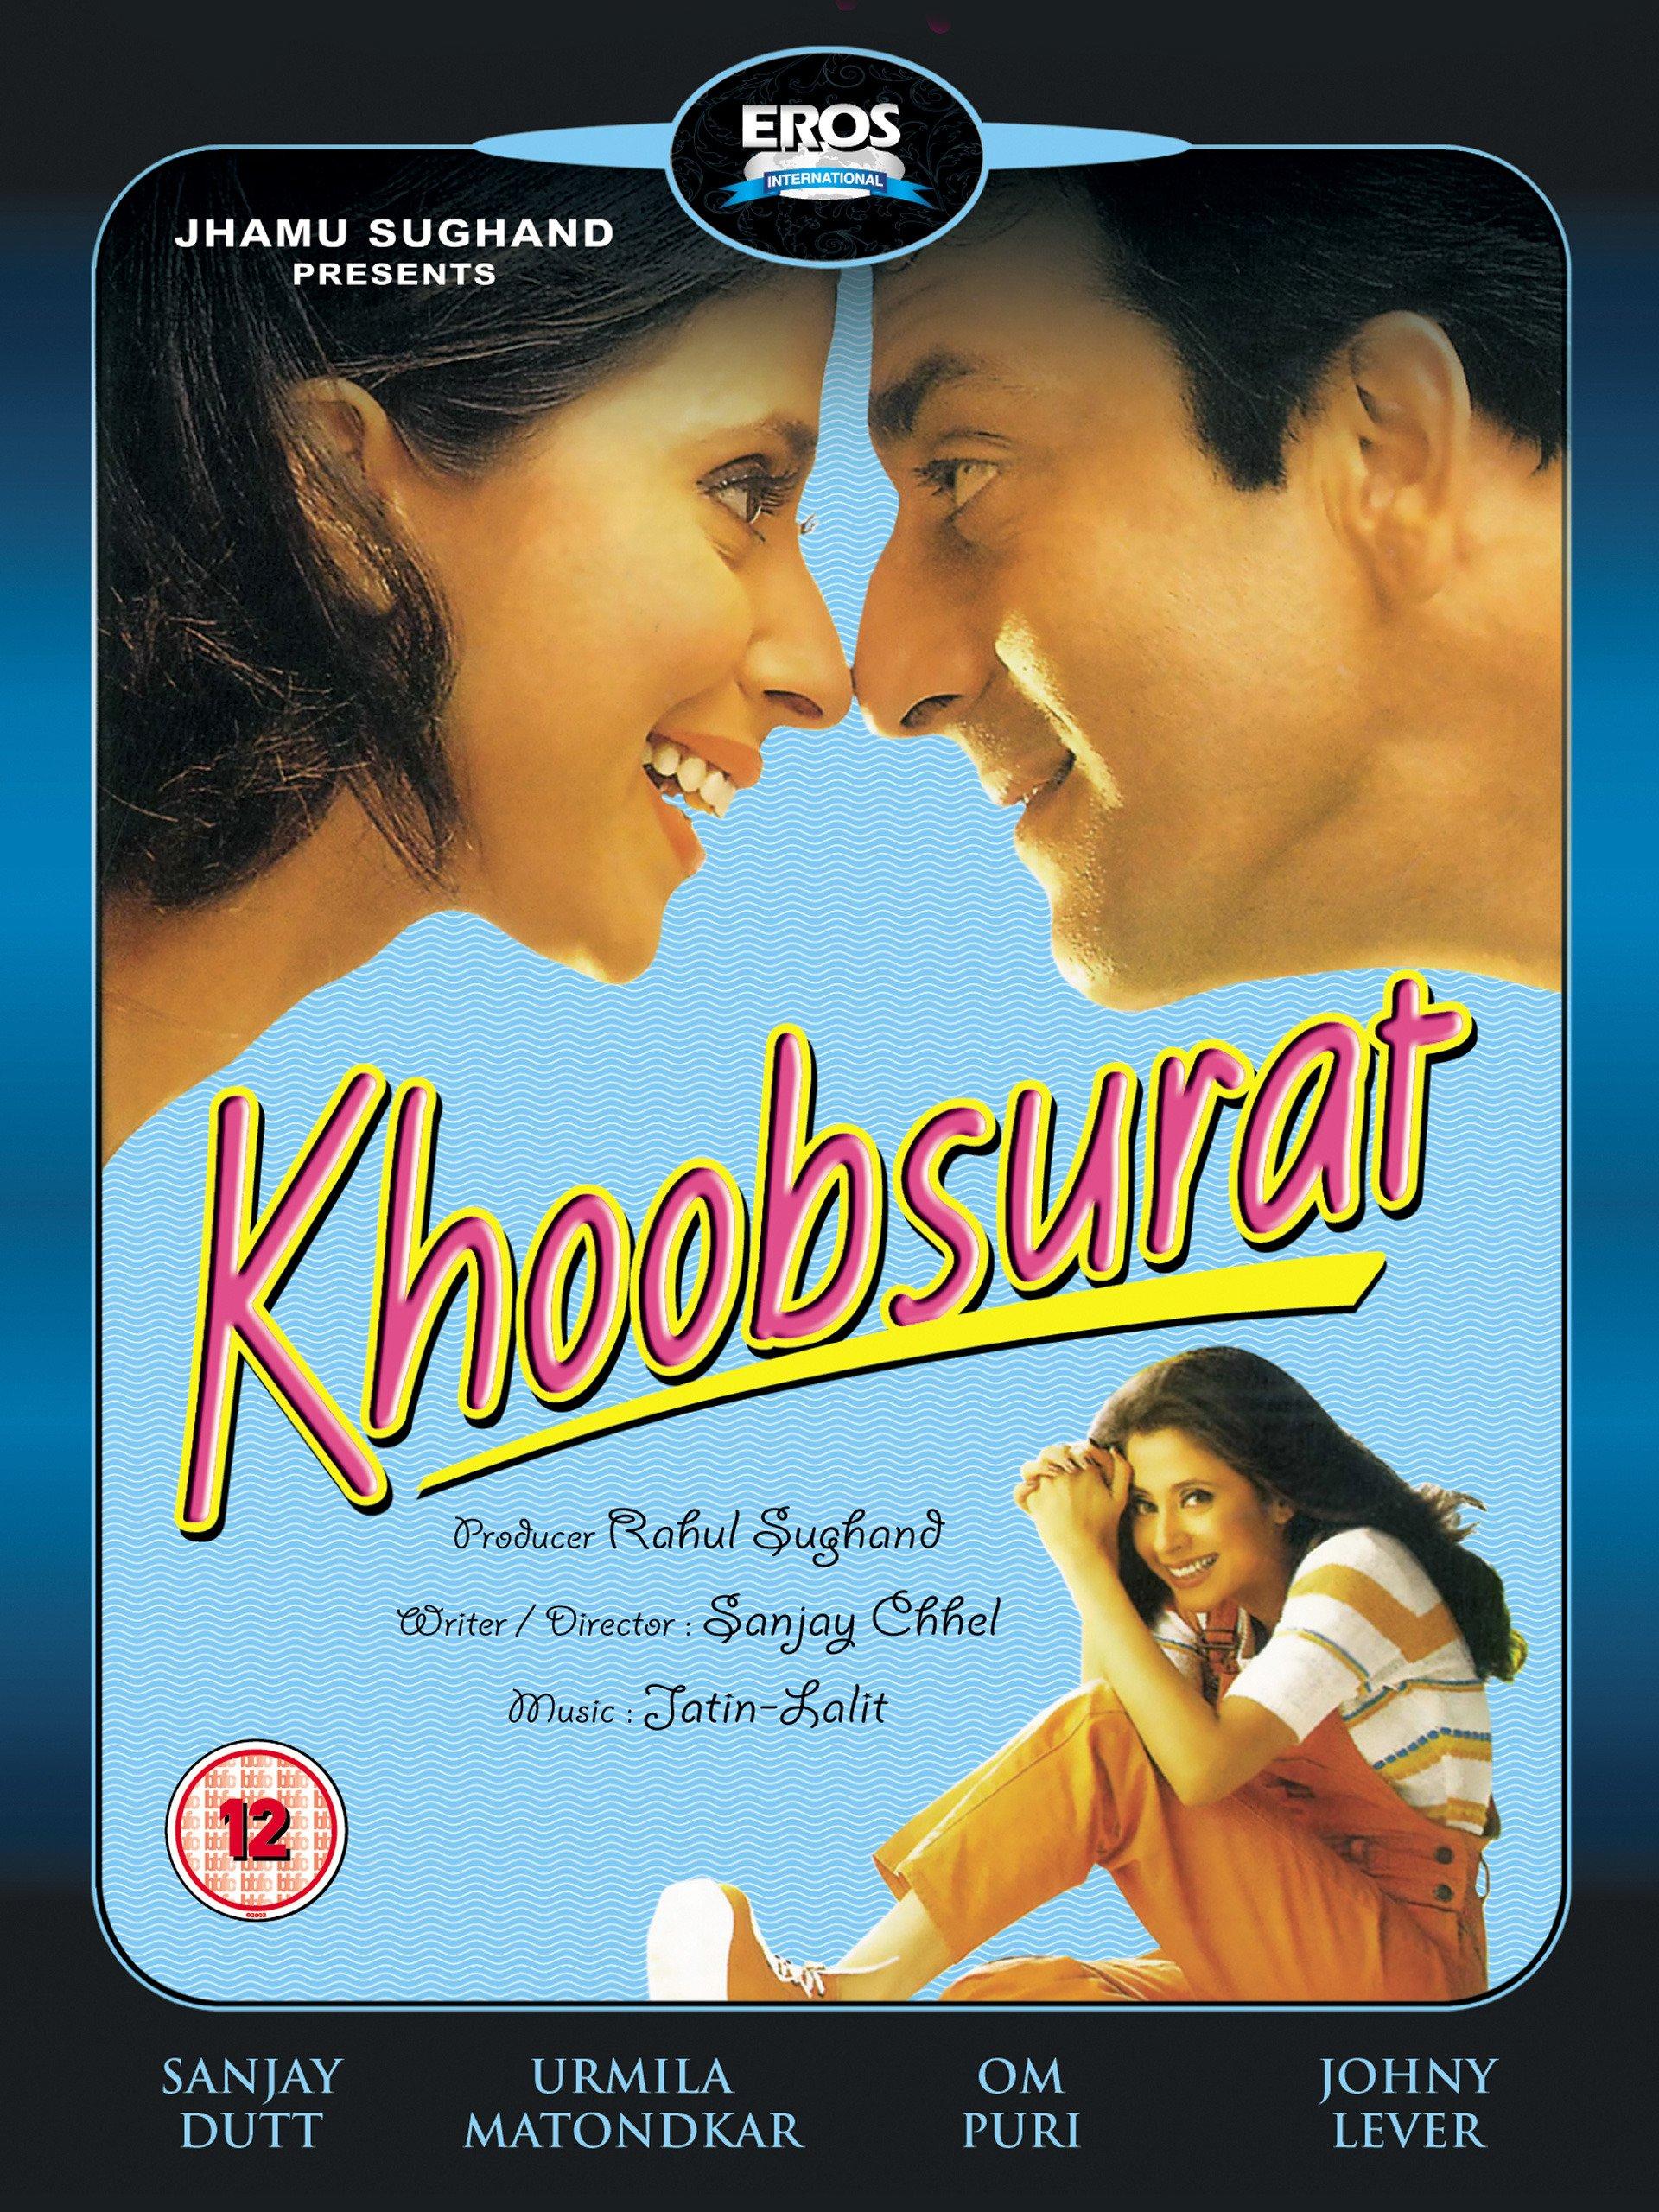 khoobsurat full movie with english subtitles free download